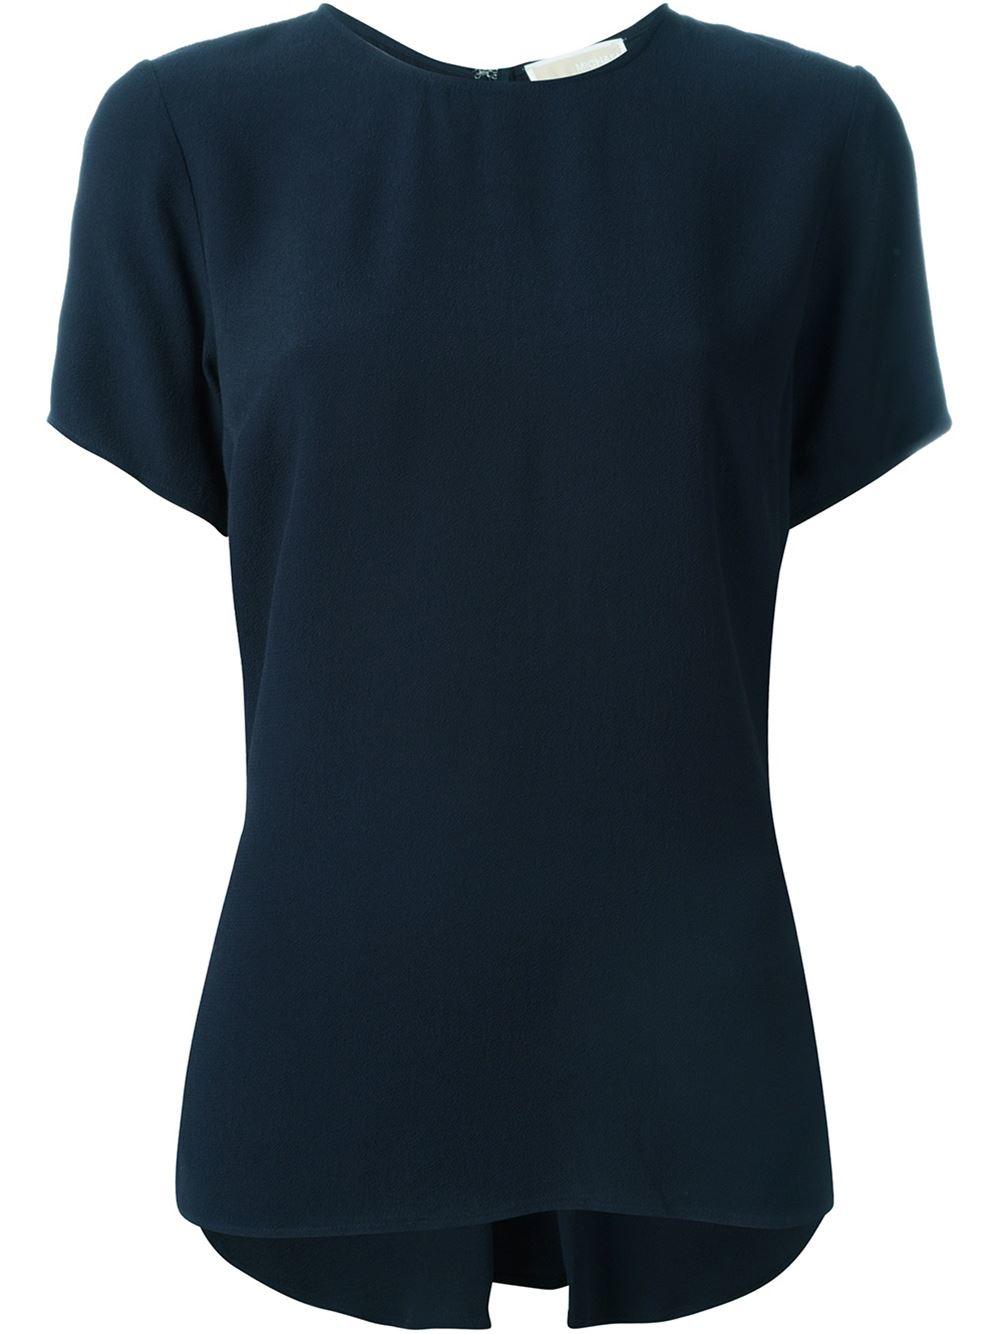 michael michael kors shortsleeved t shirt in blue lyst. Black Bedroom Furniture Sets. Home Design Ideas